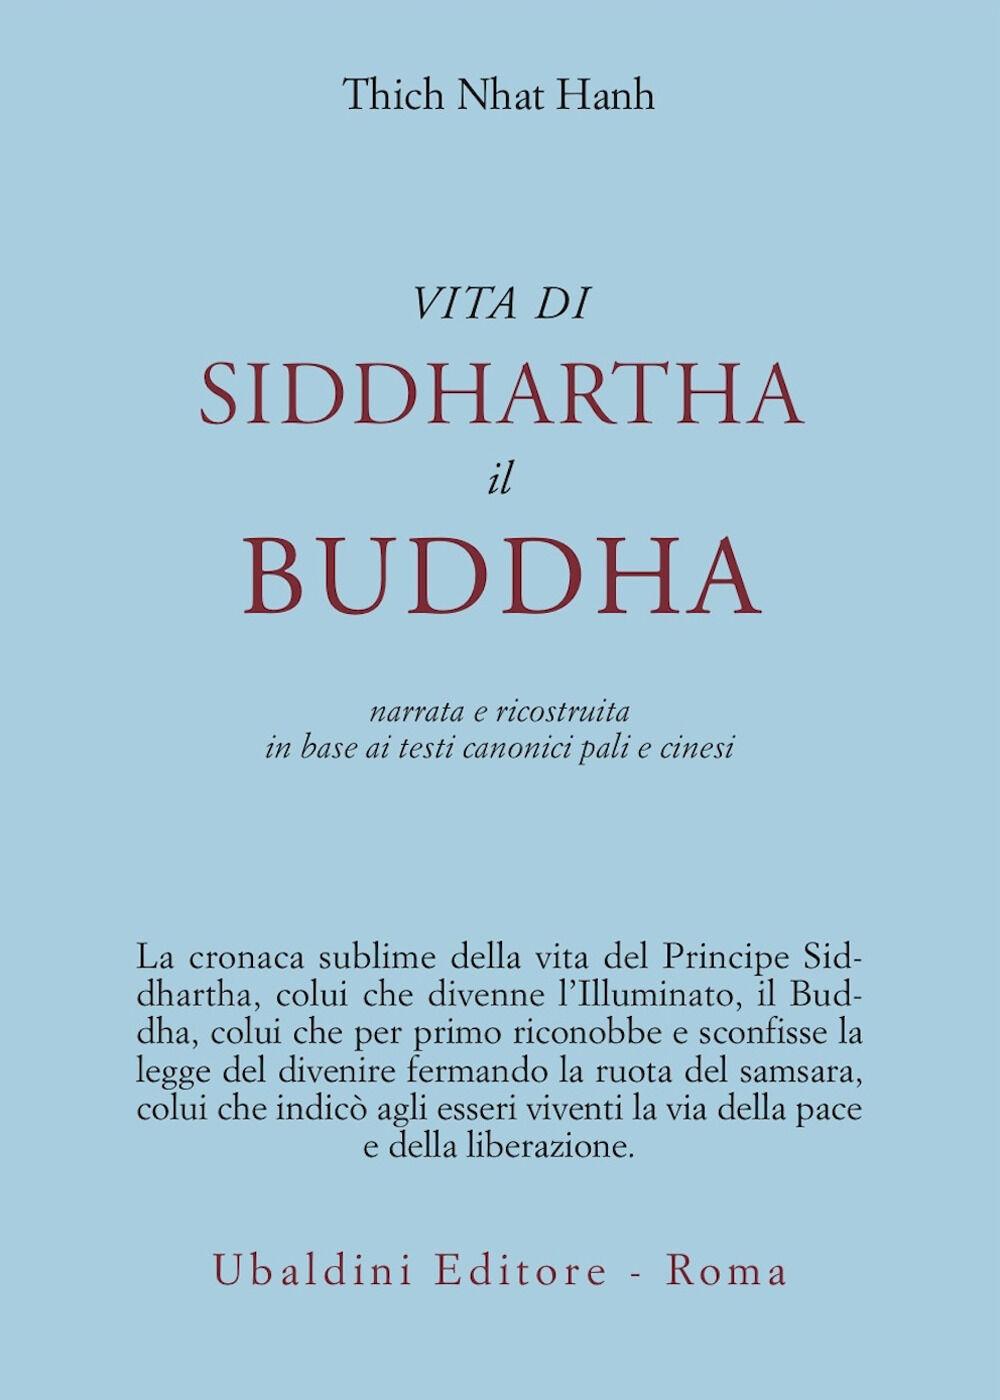 Vita di Siddhartha il Buddha. Narrata e ricostruita in base ai testi canonici pali e cinesi